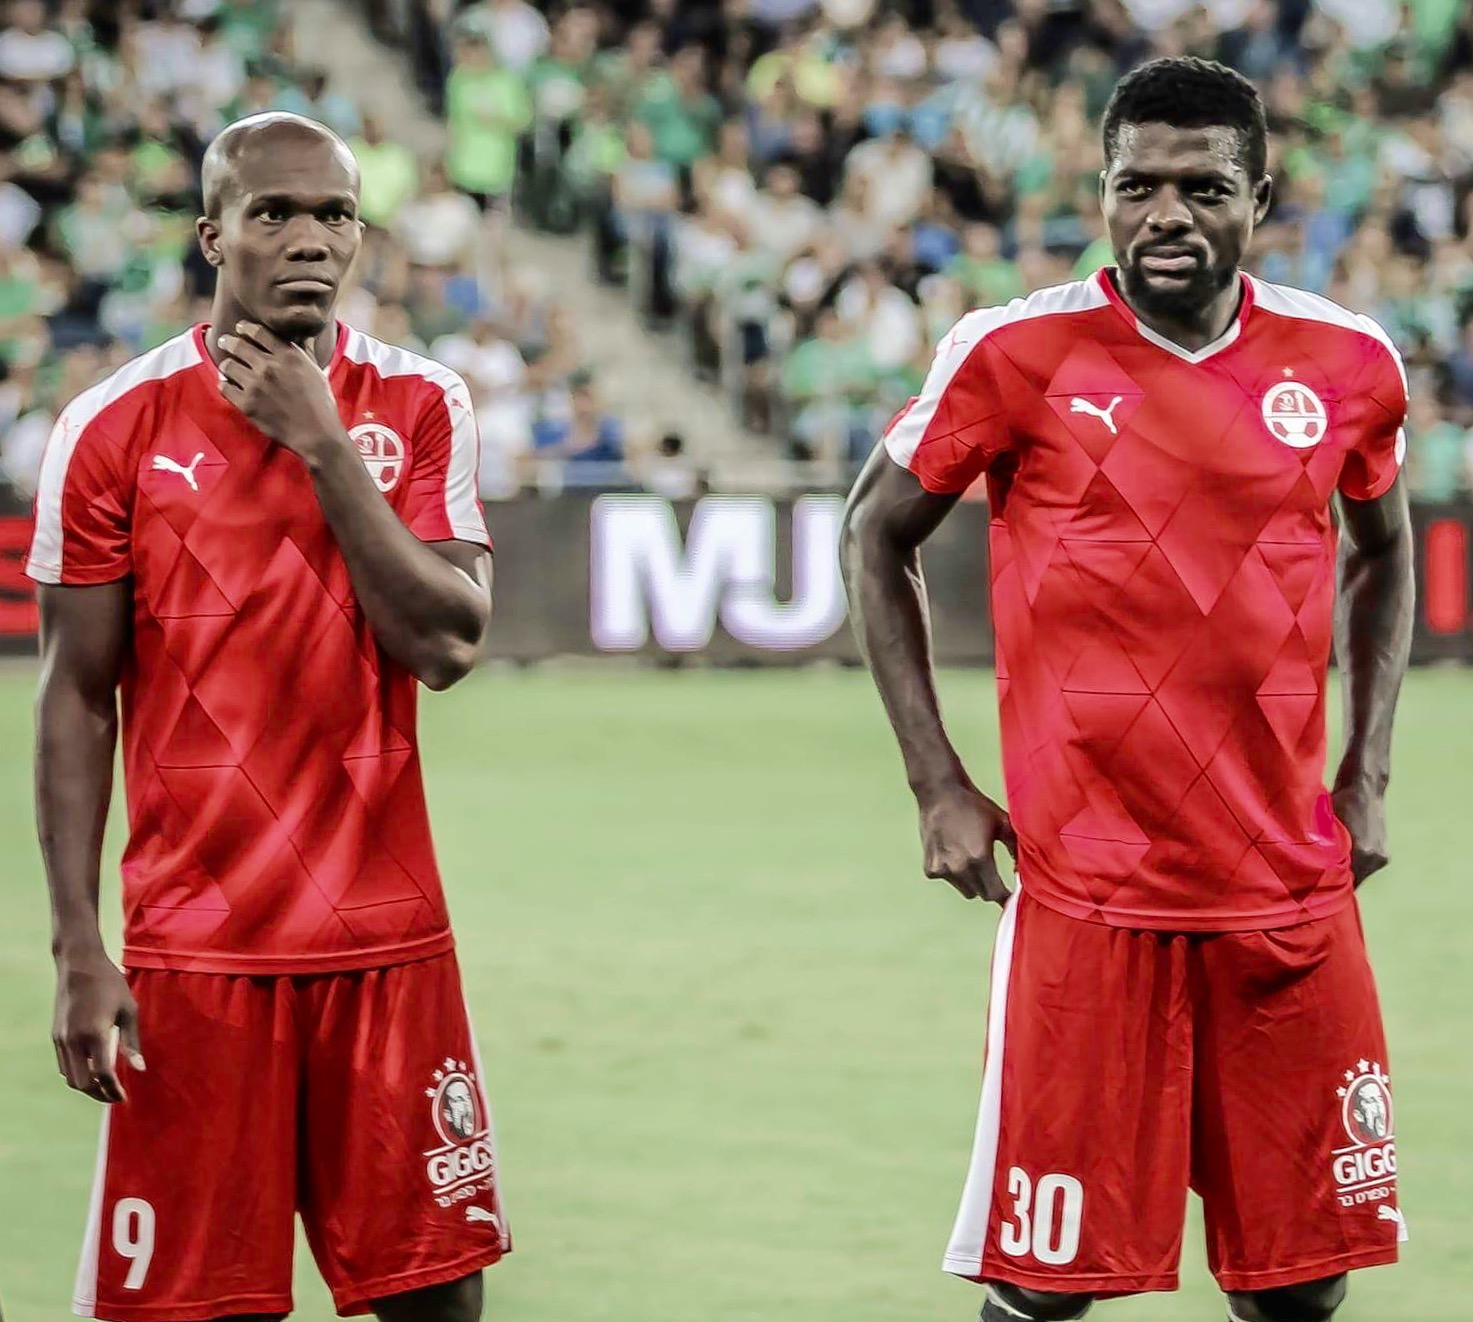 Europa League: Ogu Targets Home Win Vs Southampton